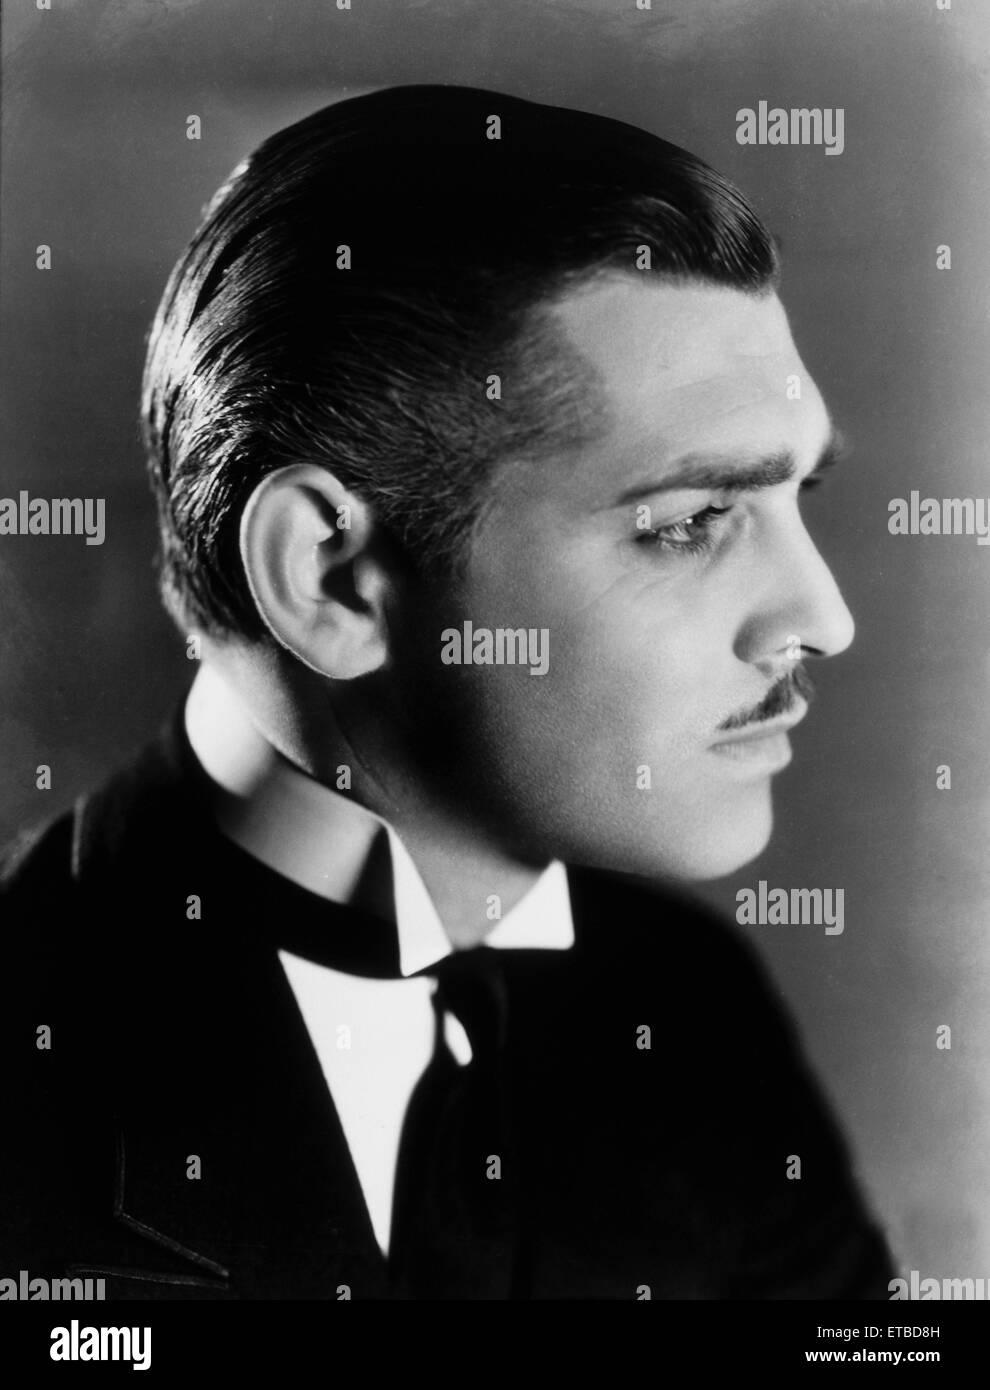 Clark Gable, Portrait, on-set of the Film 'Strange Interlude', 1932 - Stock Image